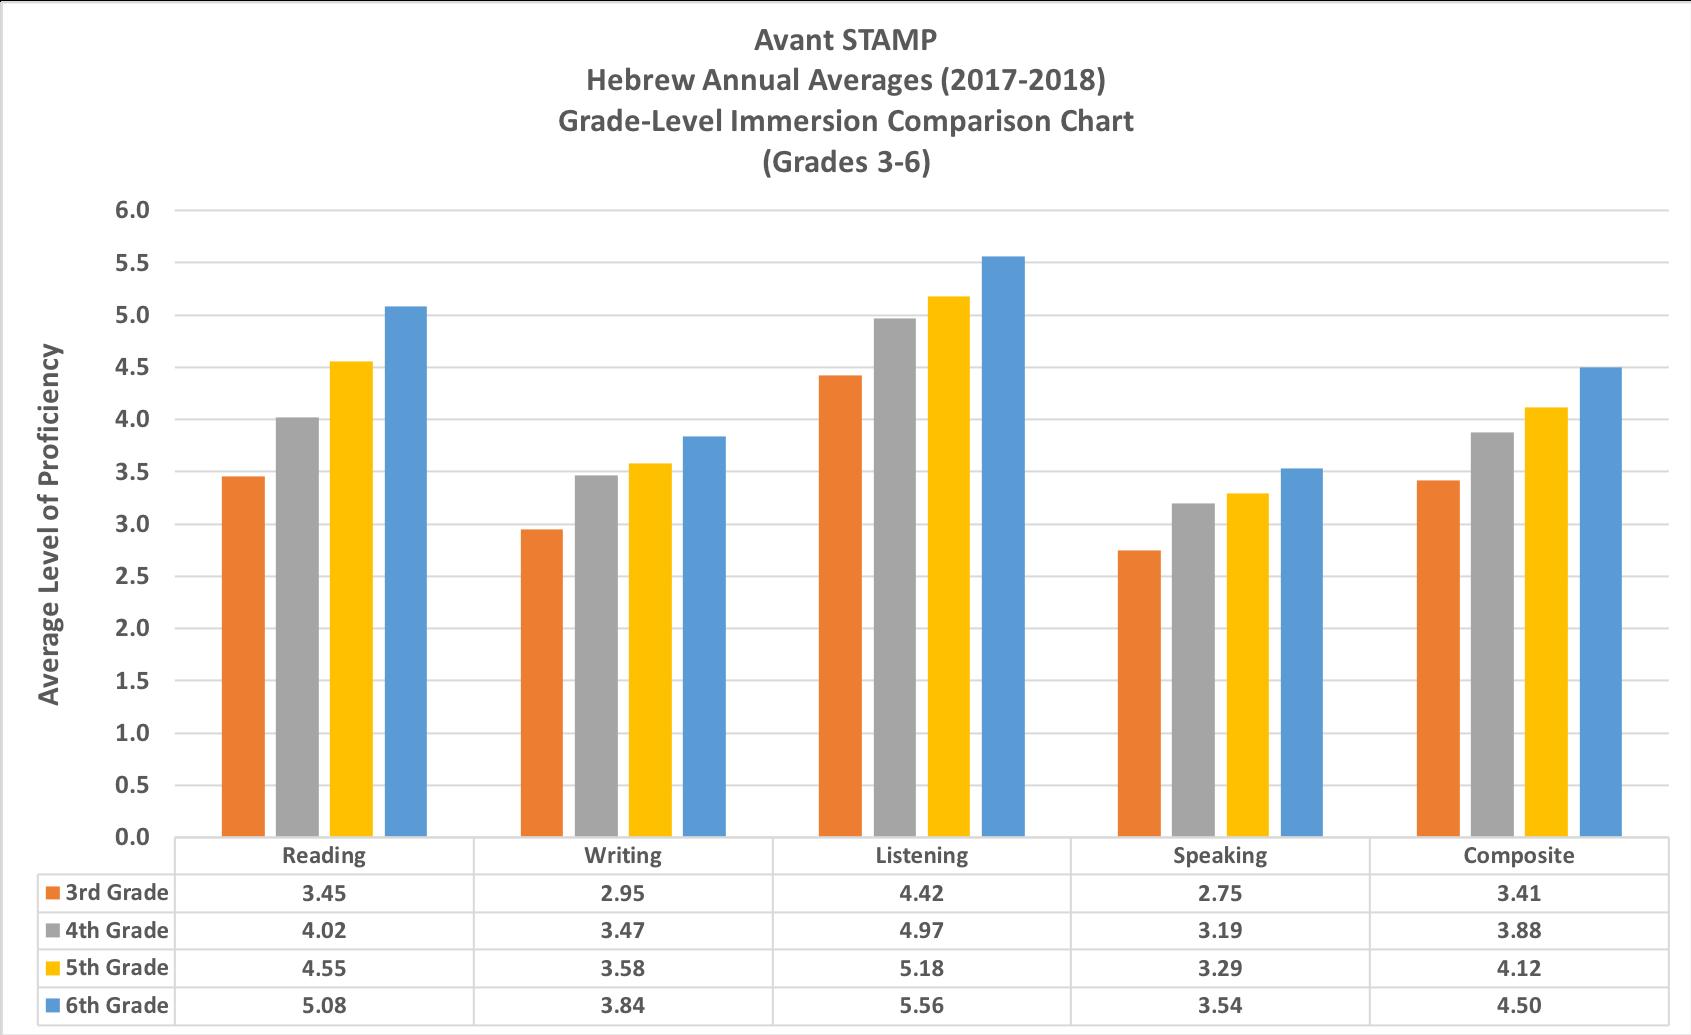 STAMP_Hebrew_AcadYear2017-2018_grades3_6.png